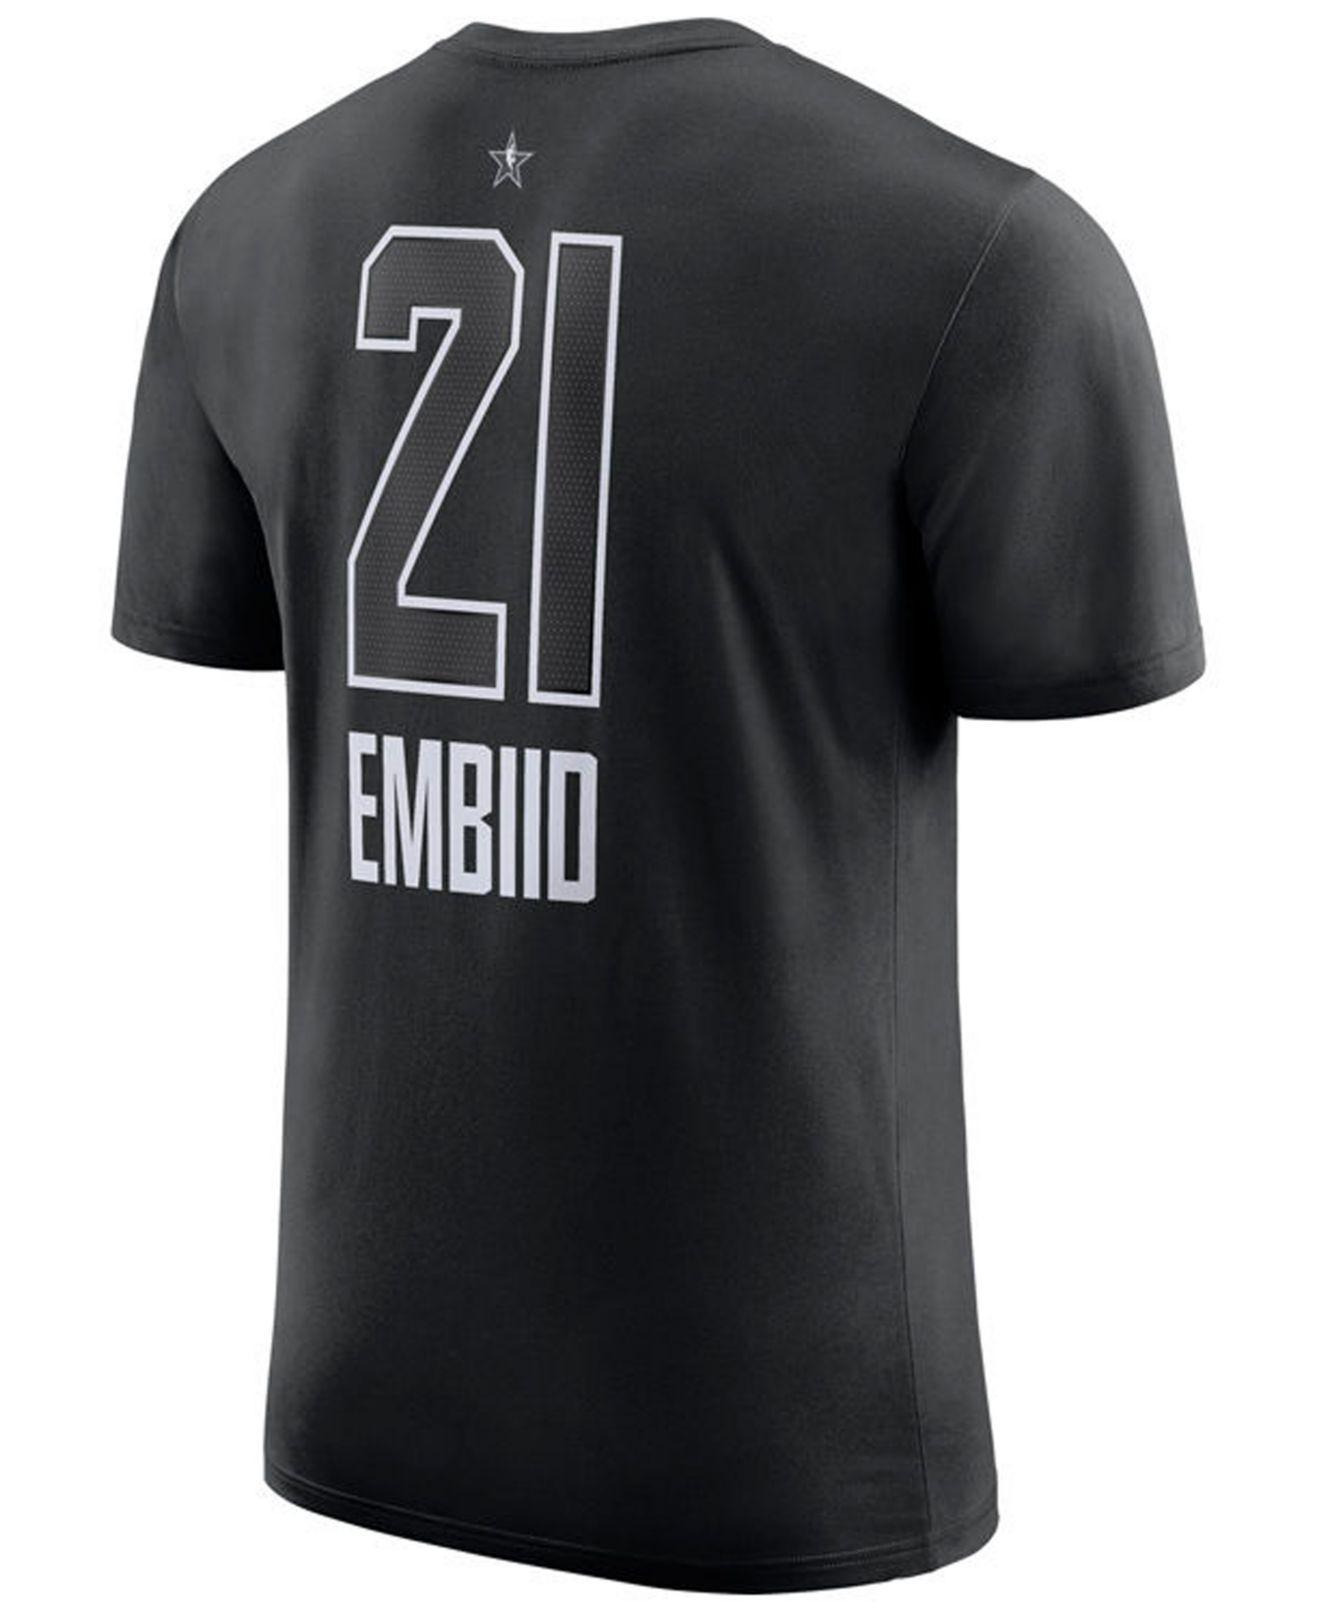 9aa556960d3648 Lyst - Nike Joel Embiid Philadelphia 76ers All-star Player T-shirt ...